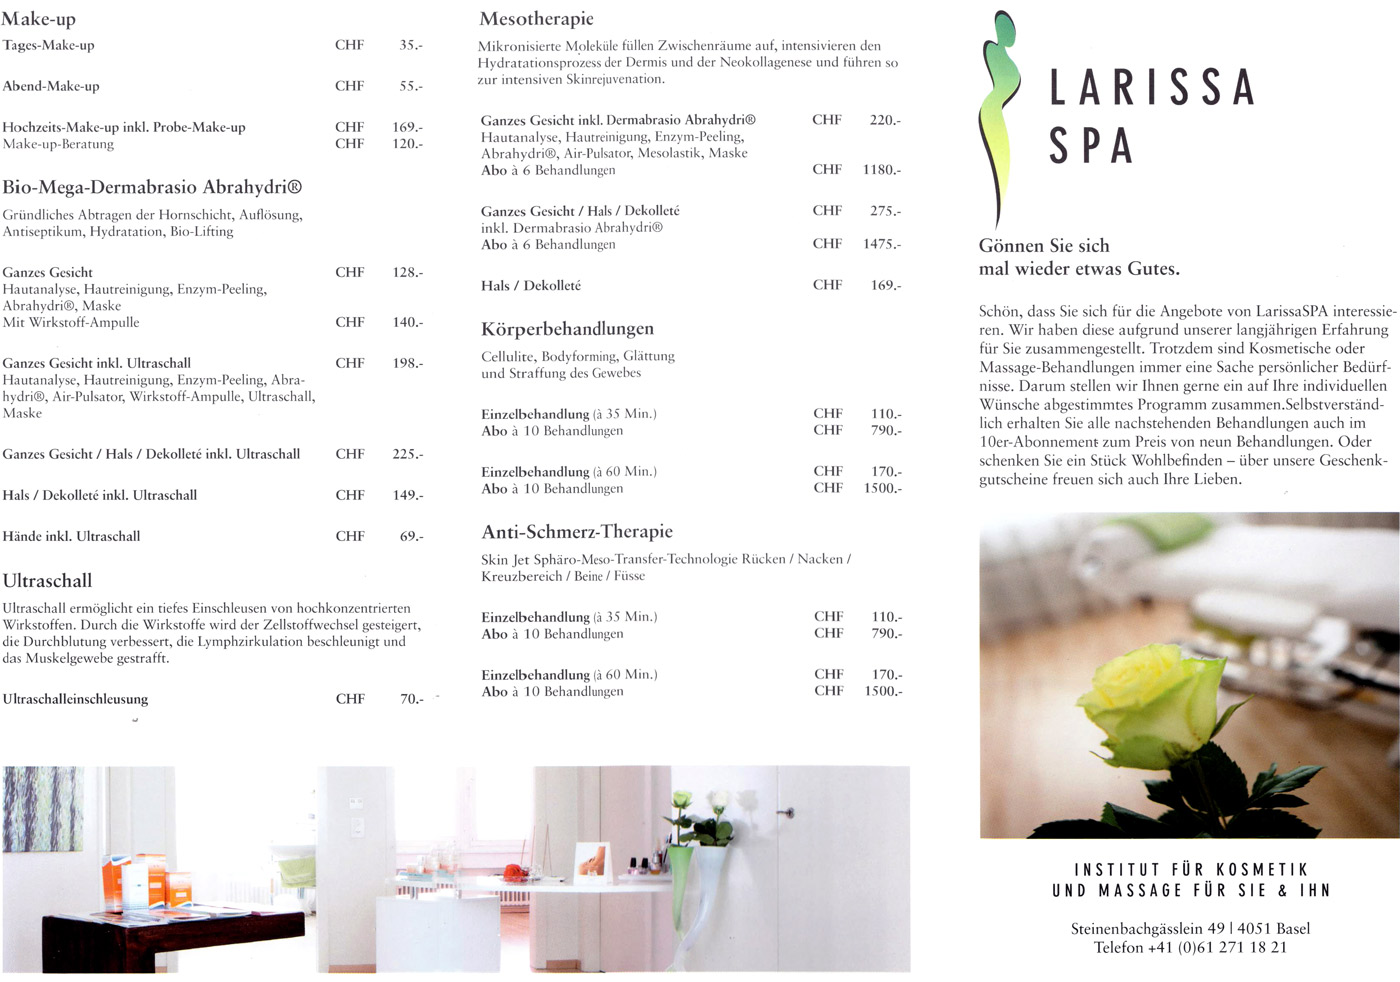 Larissa SPA, Kosmetik Basel